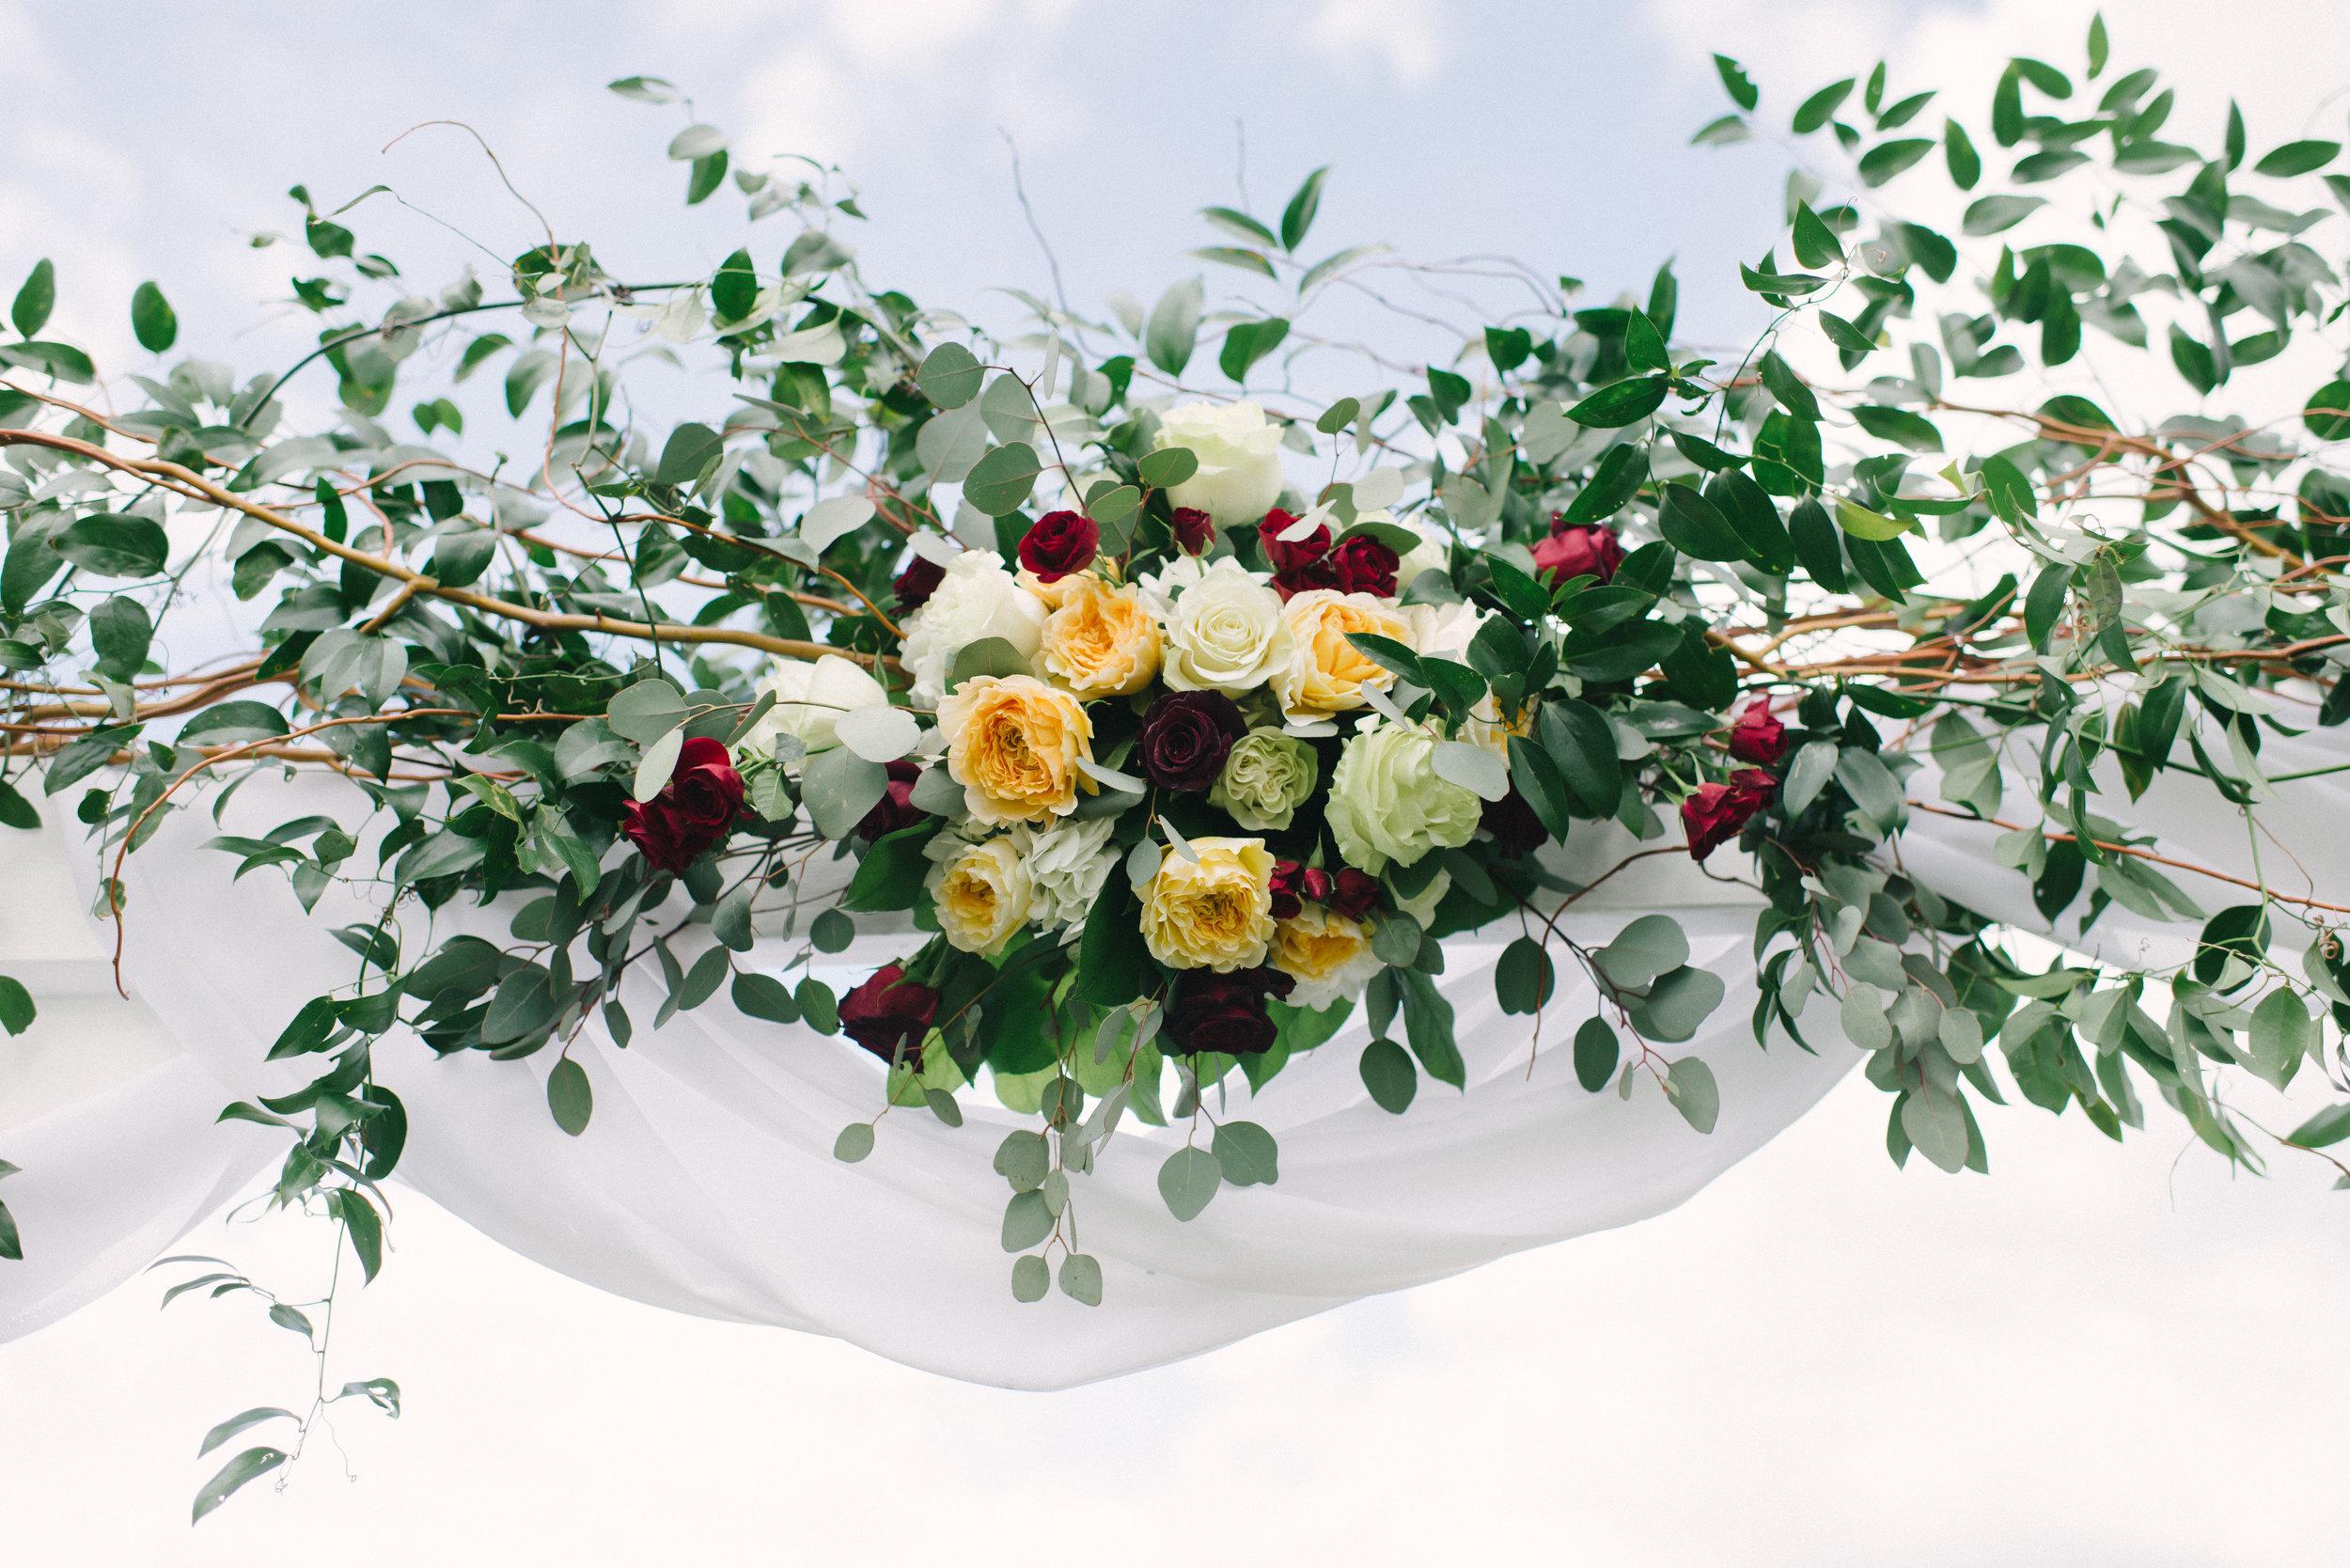 KateTaramykinStudios-Portfolio-Weddings-WinterPark-6.jpg